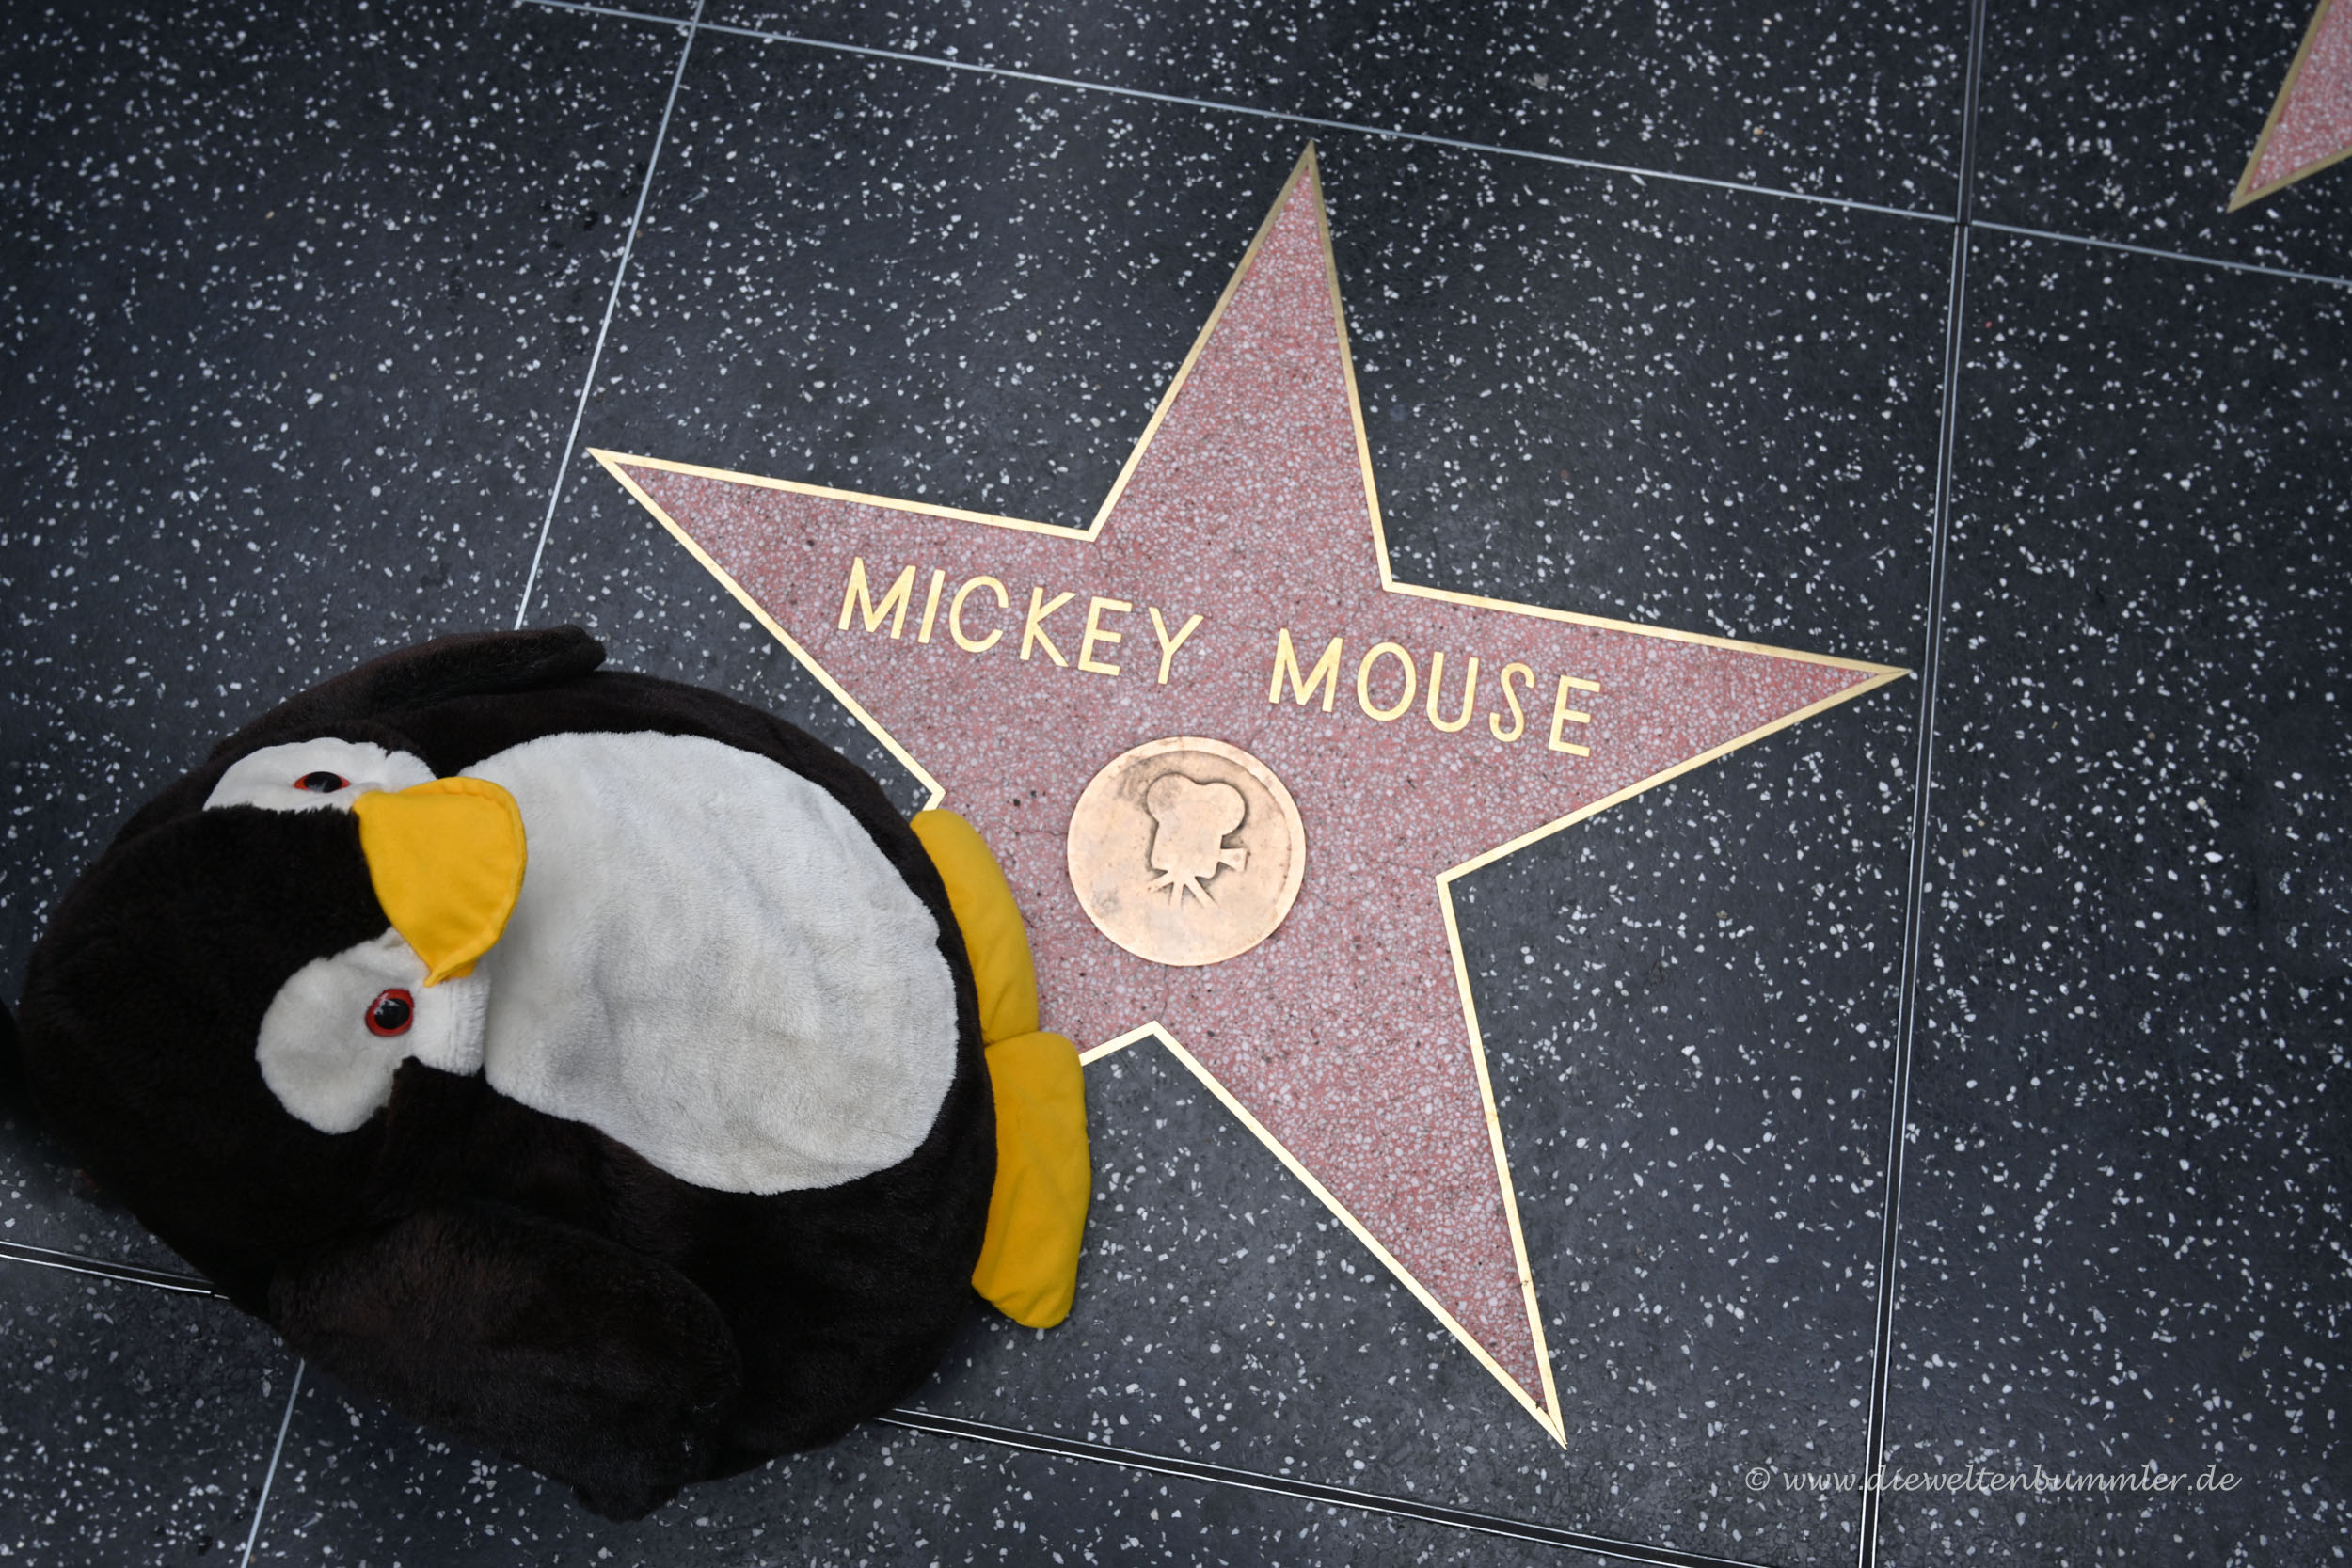 Walk of Fame - Micky Maus